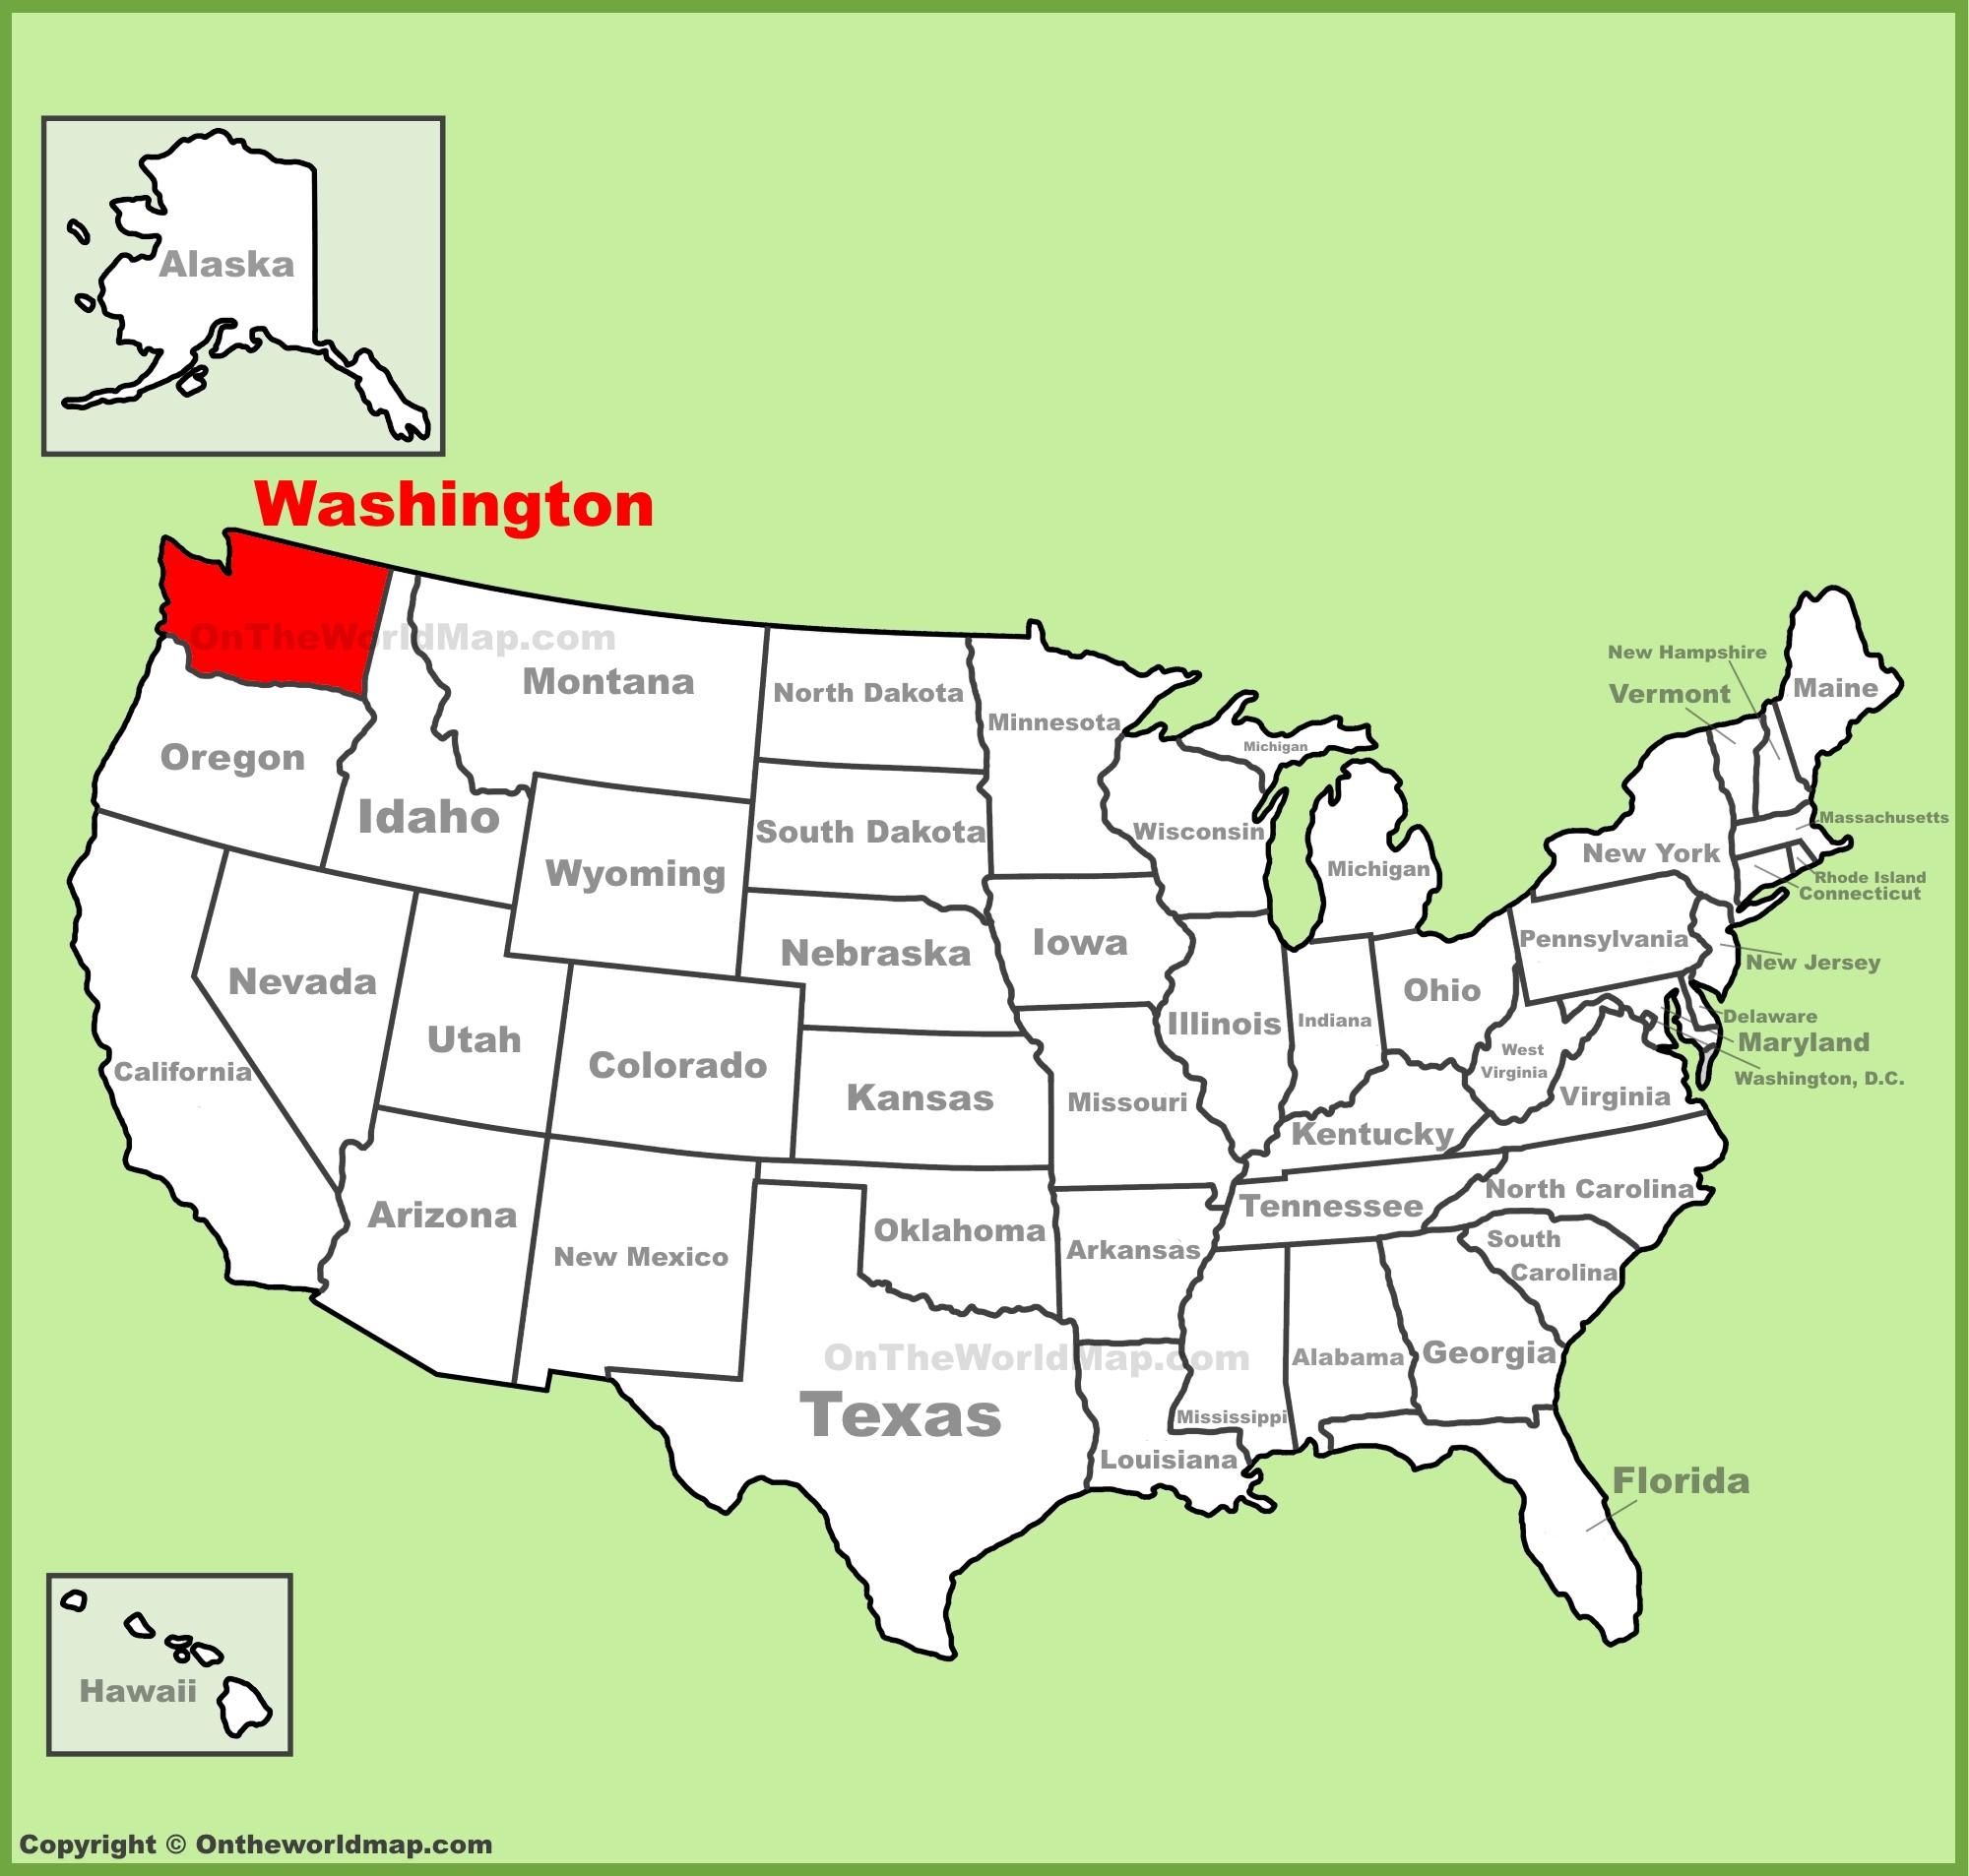 Washington State Maps   Usa   Maps Of Washington (Wa) - Printable Map Of Washington State